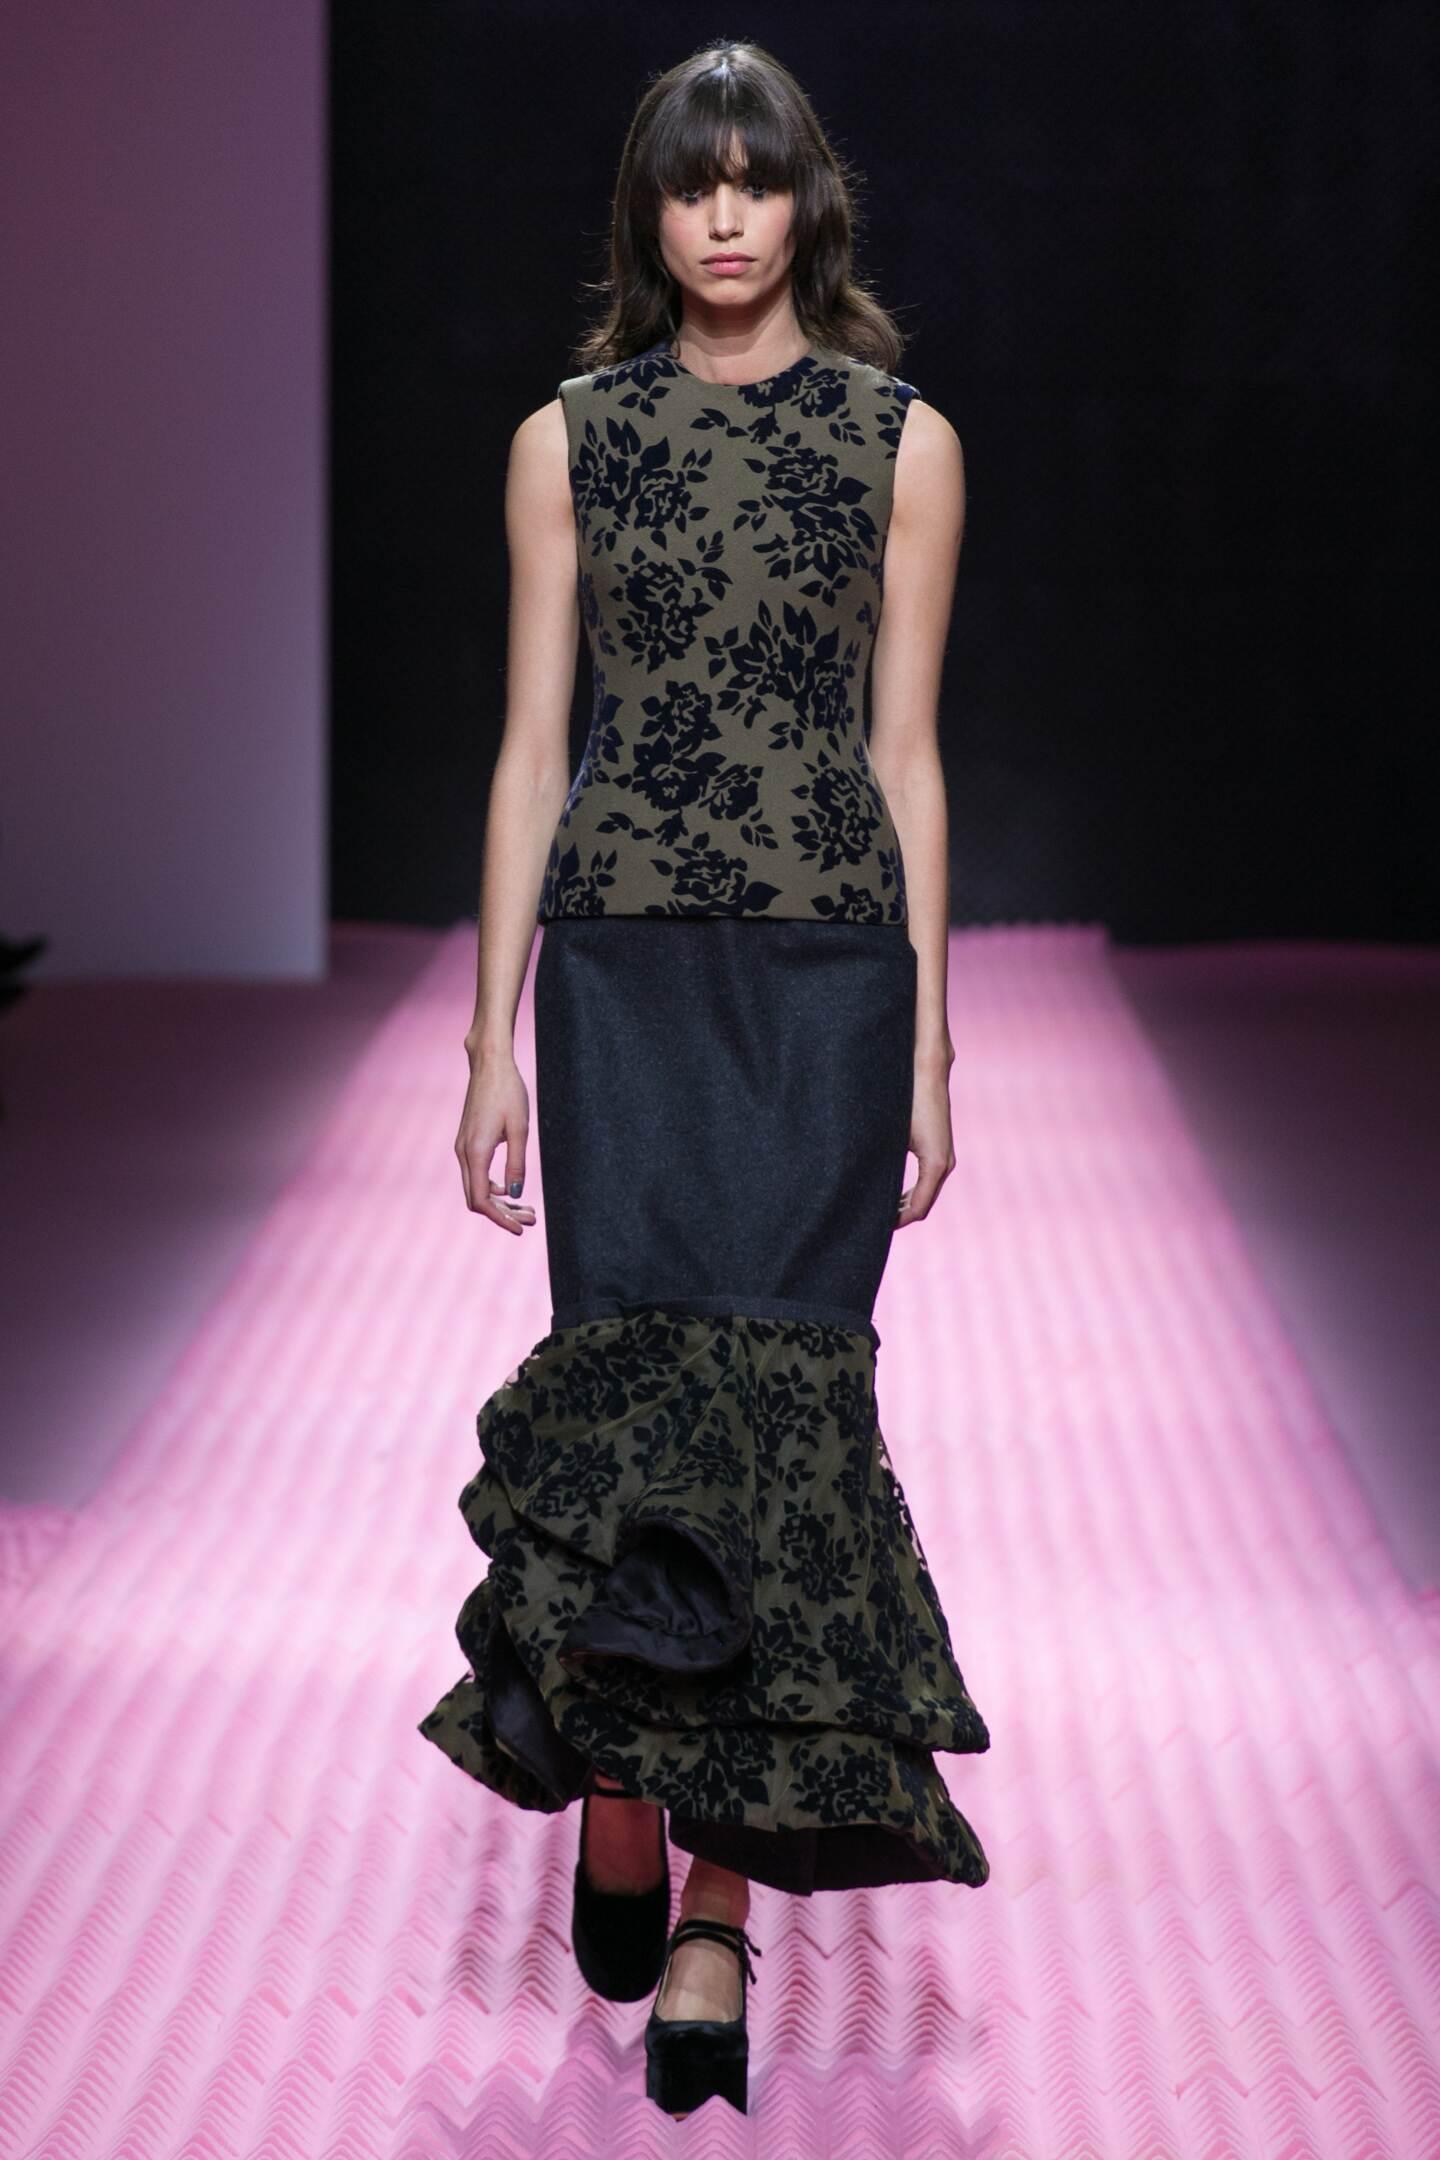 Mary Katrantzou Fall Winter 2015 16 Women's Collection London Fashion Week